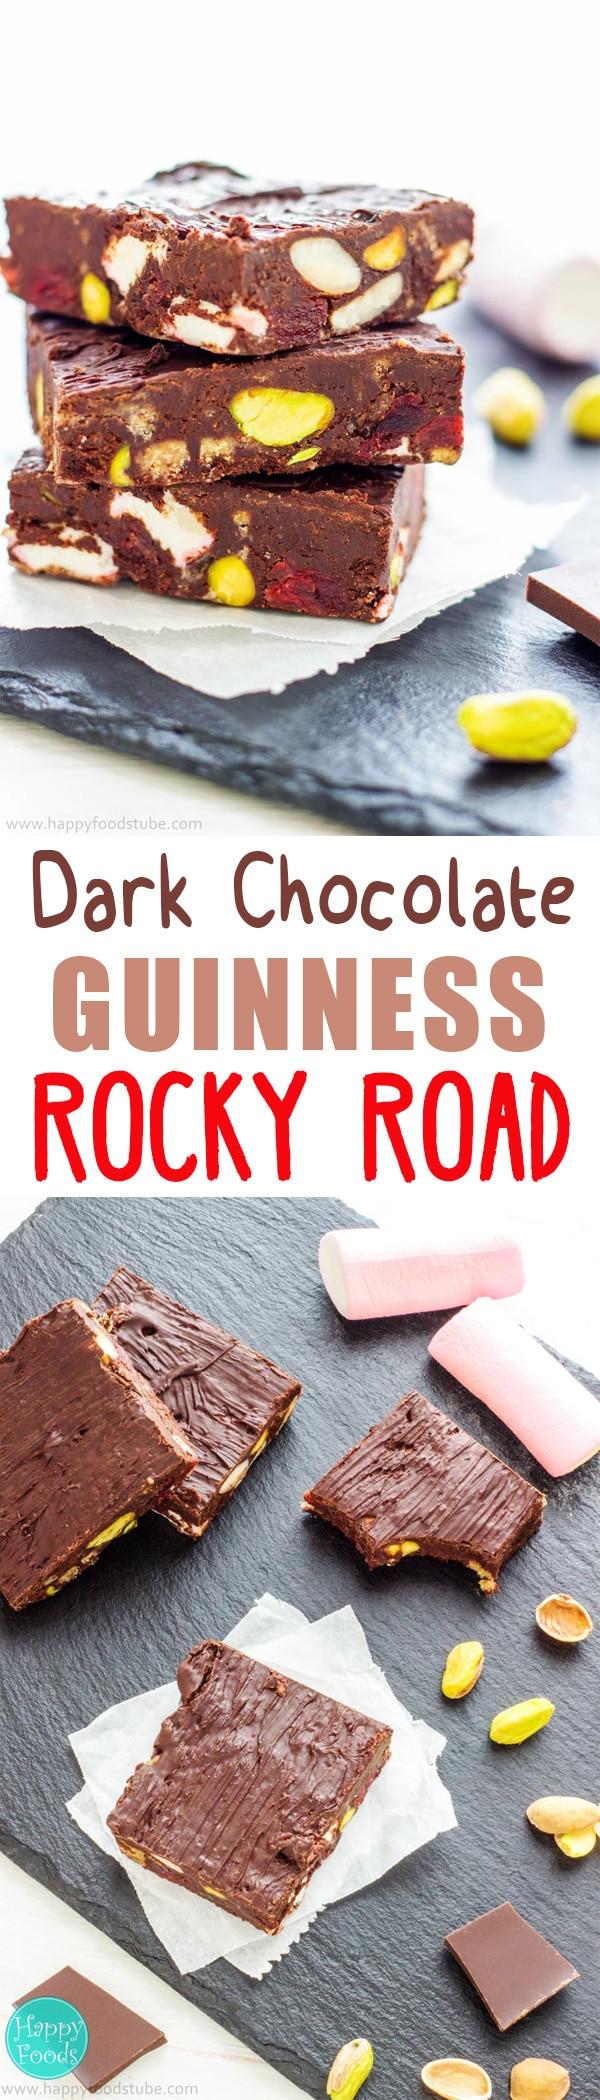 Chocolate Orange Guinness Cake Recipe